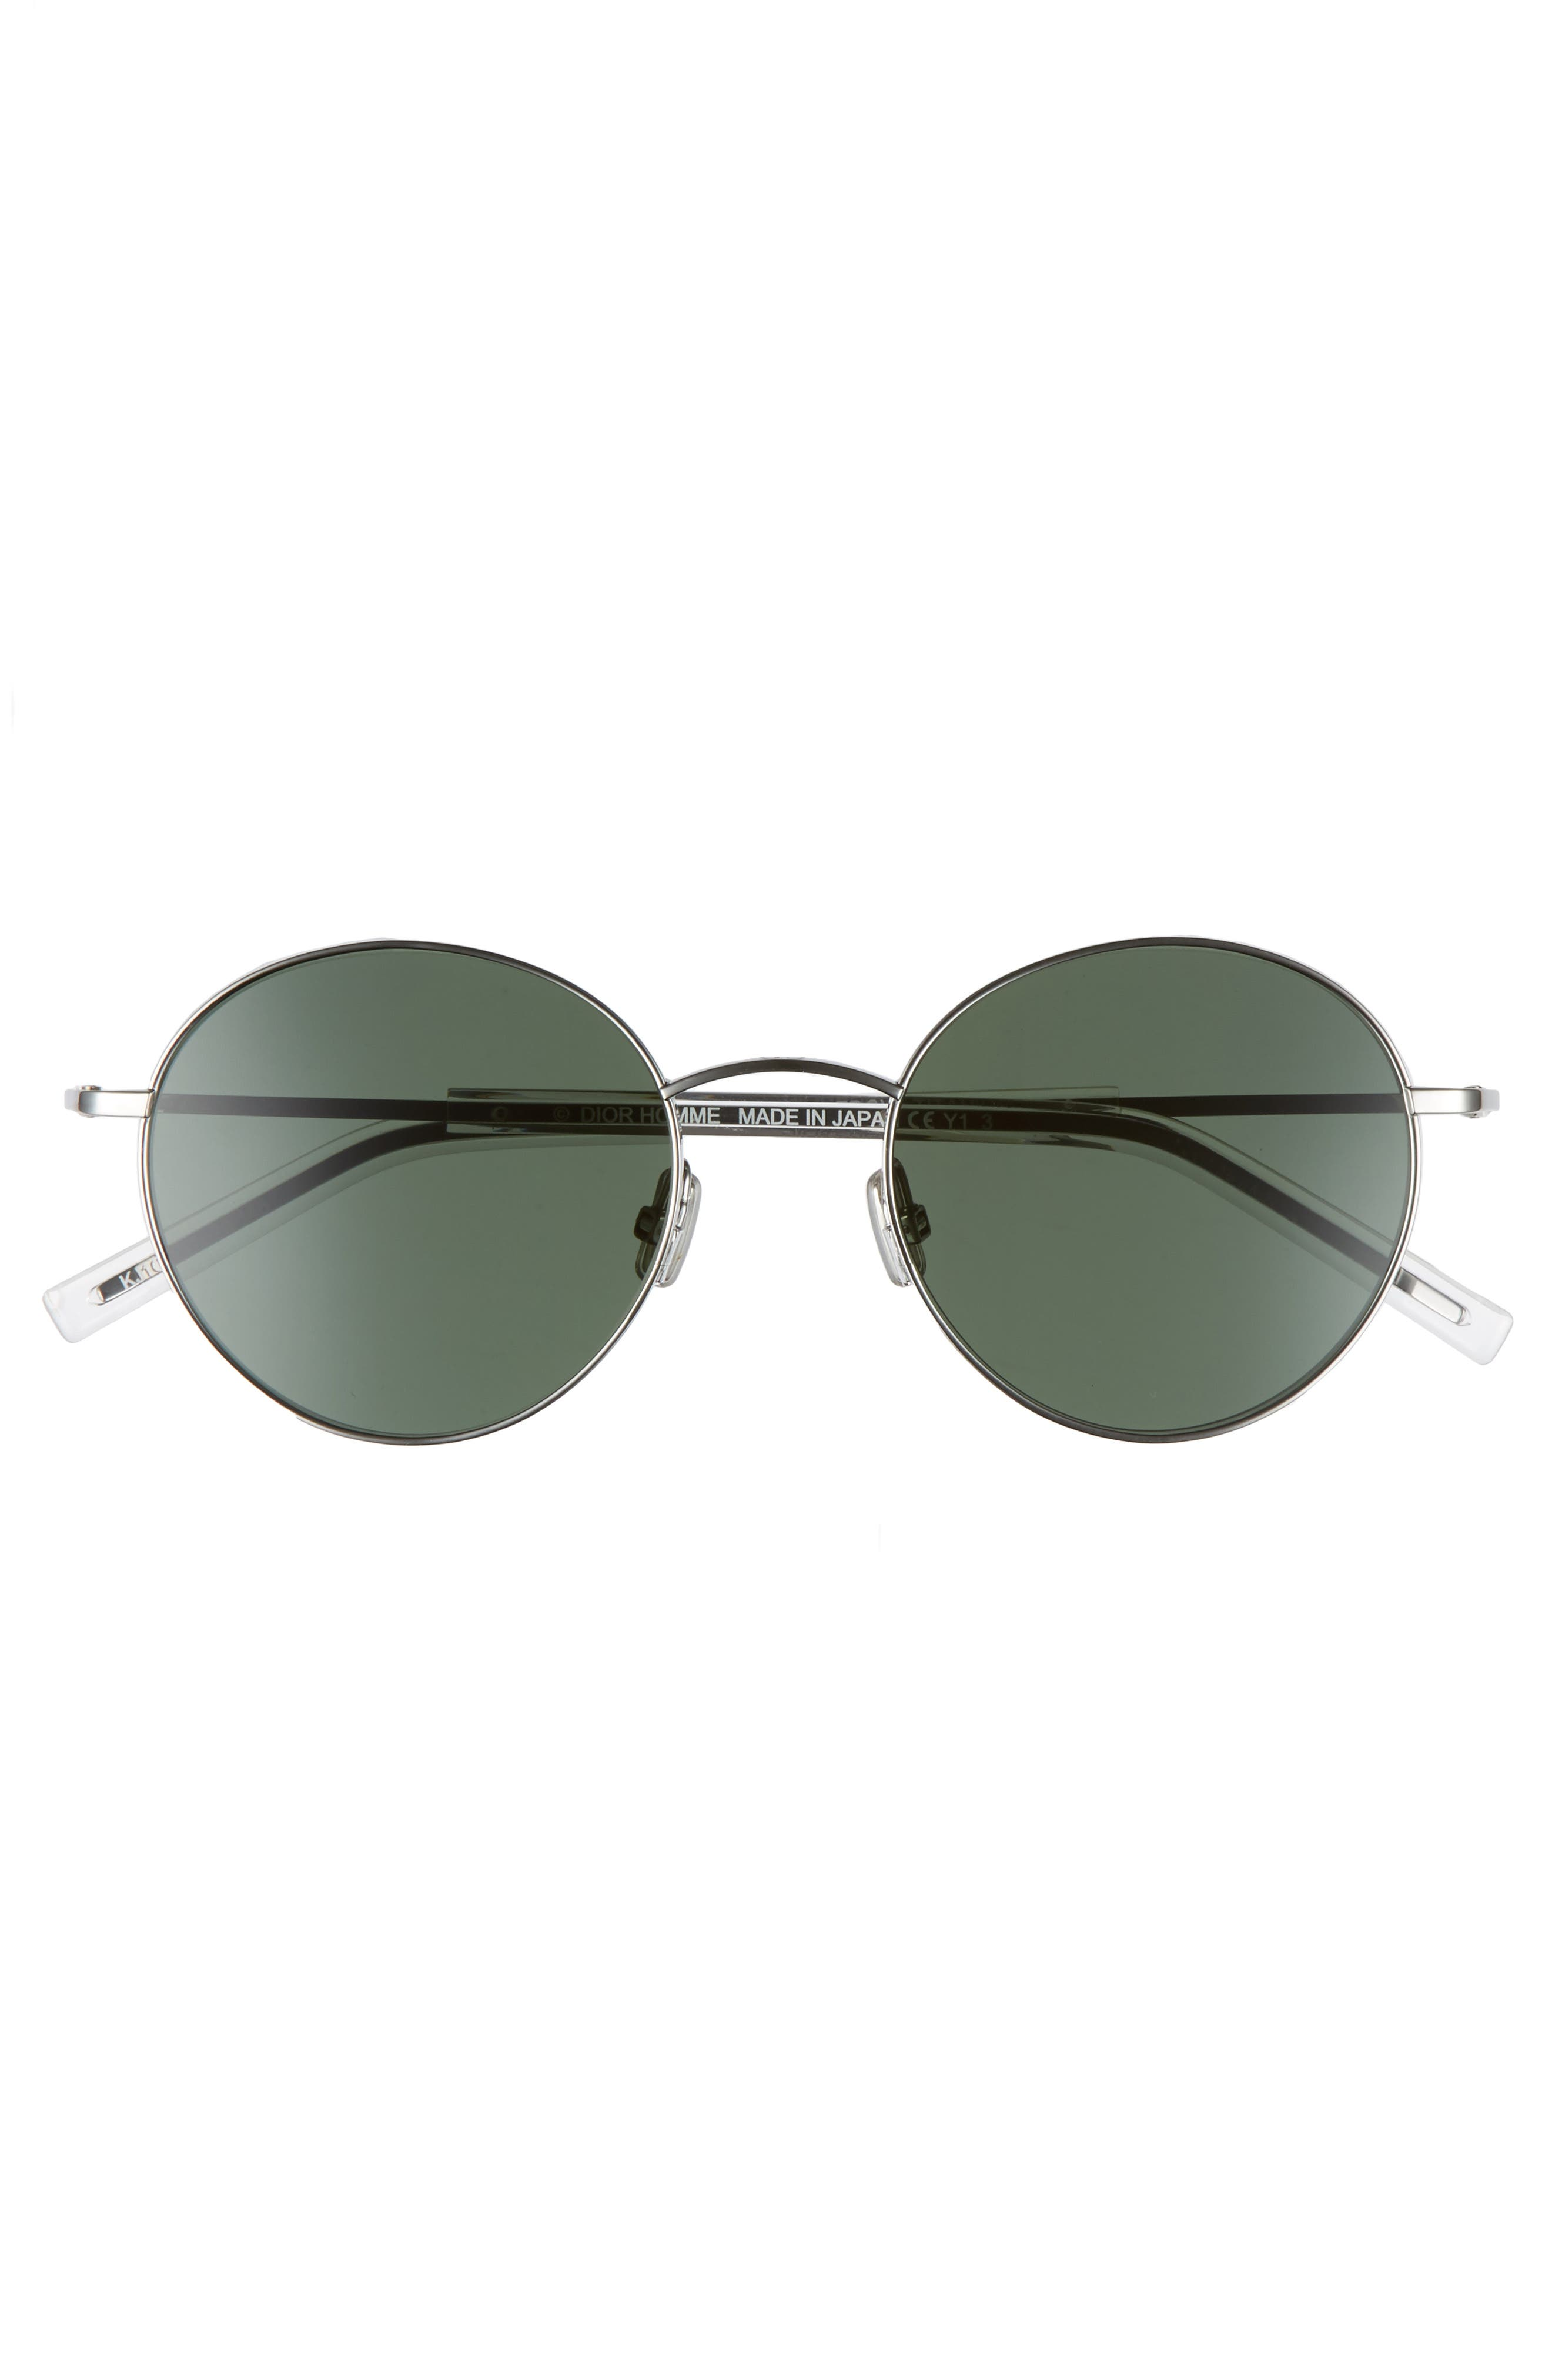 Edgy 52mm Sunglasses,                             Alternate thumbnail 2, color,                             DARK RUTHENIUM